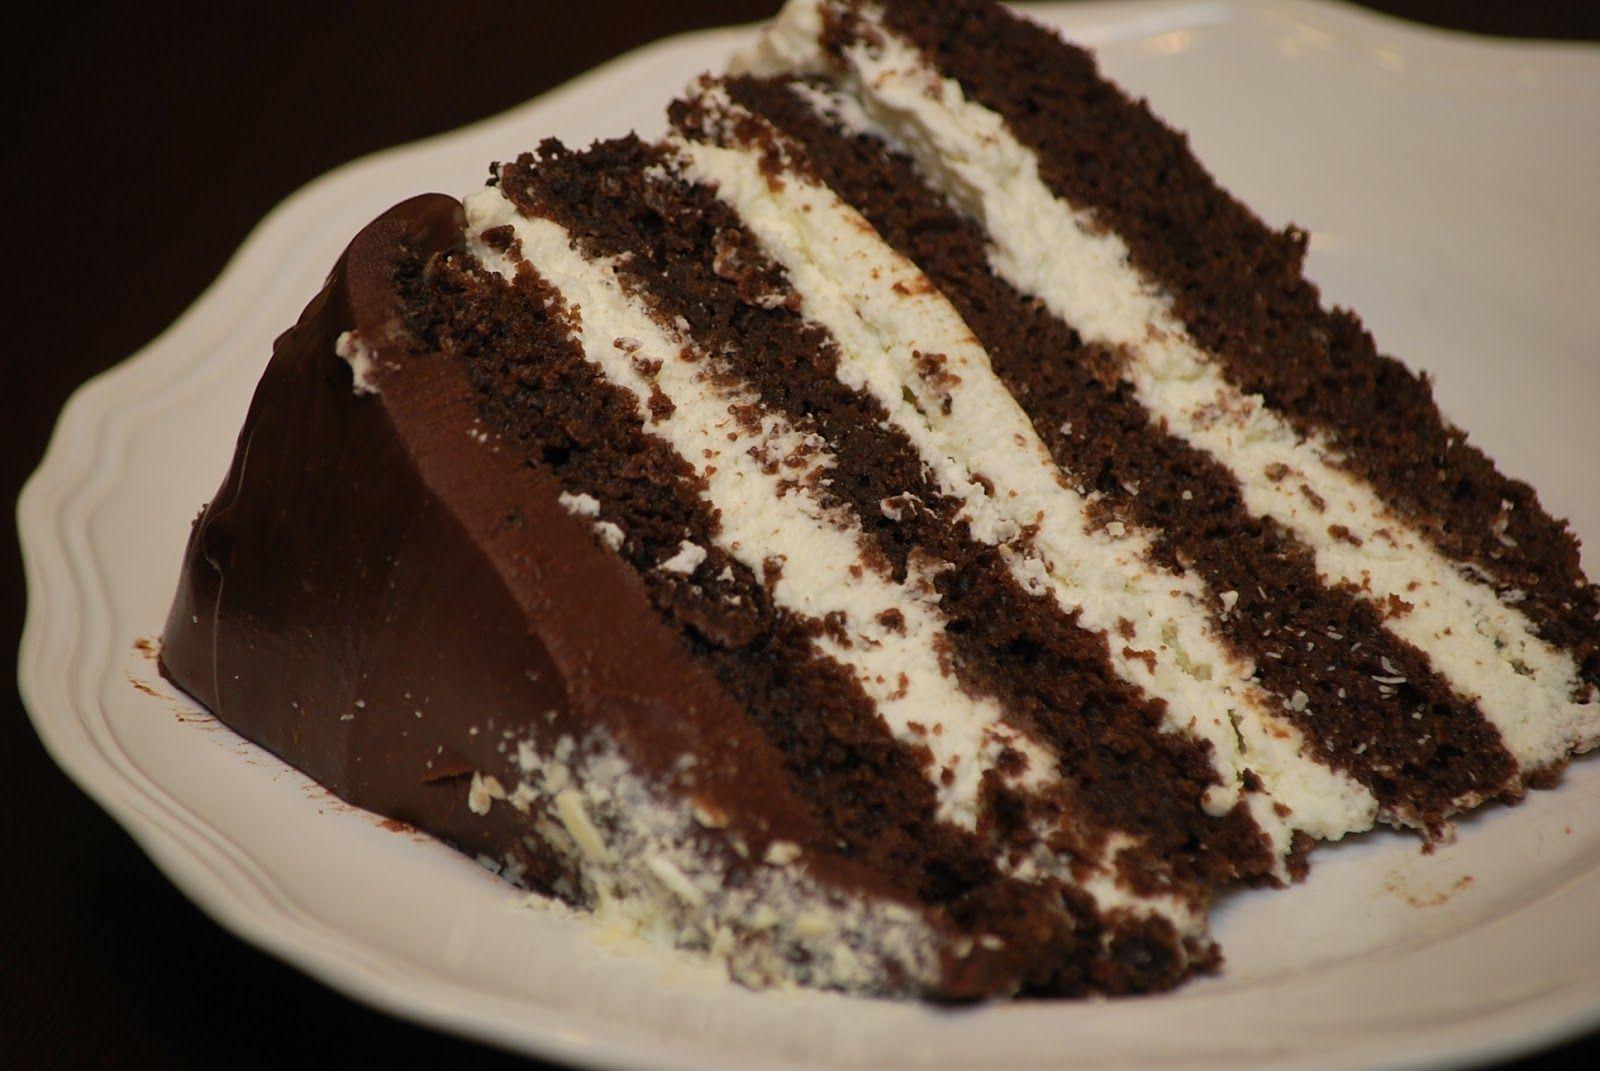 Chocolate i love chocolate publix chocolate ganache